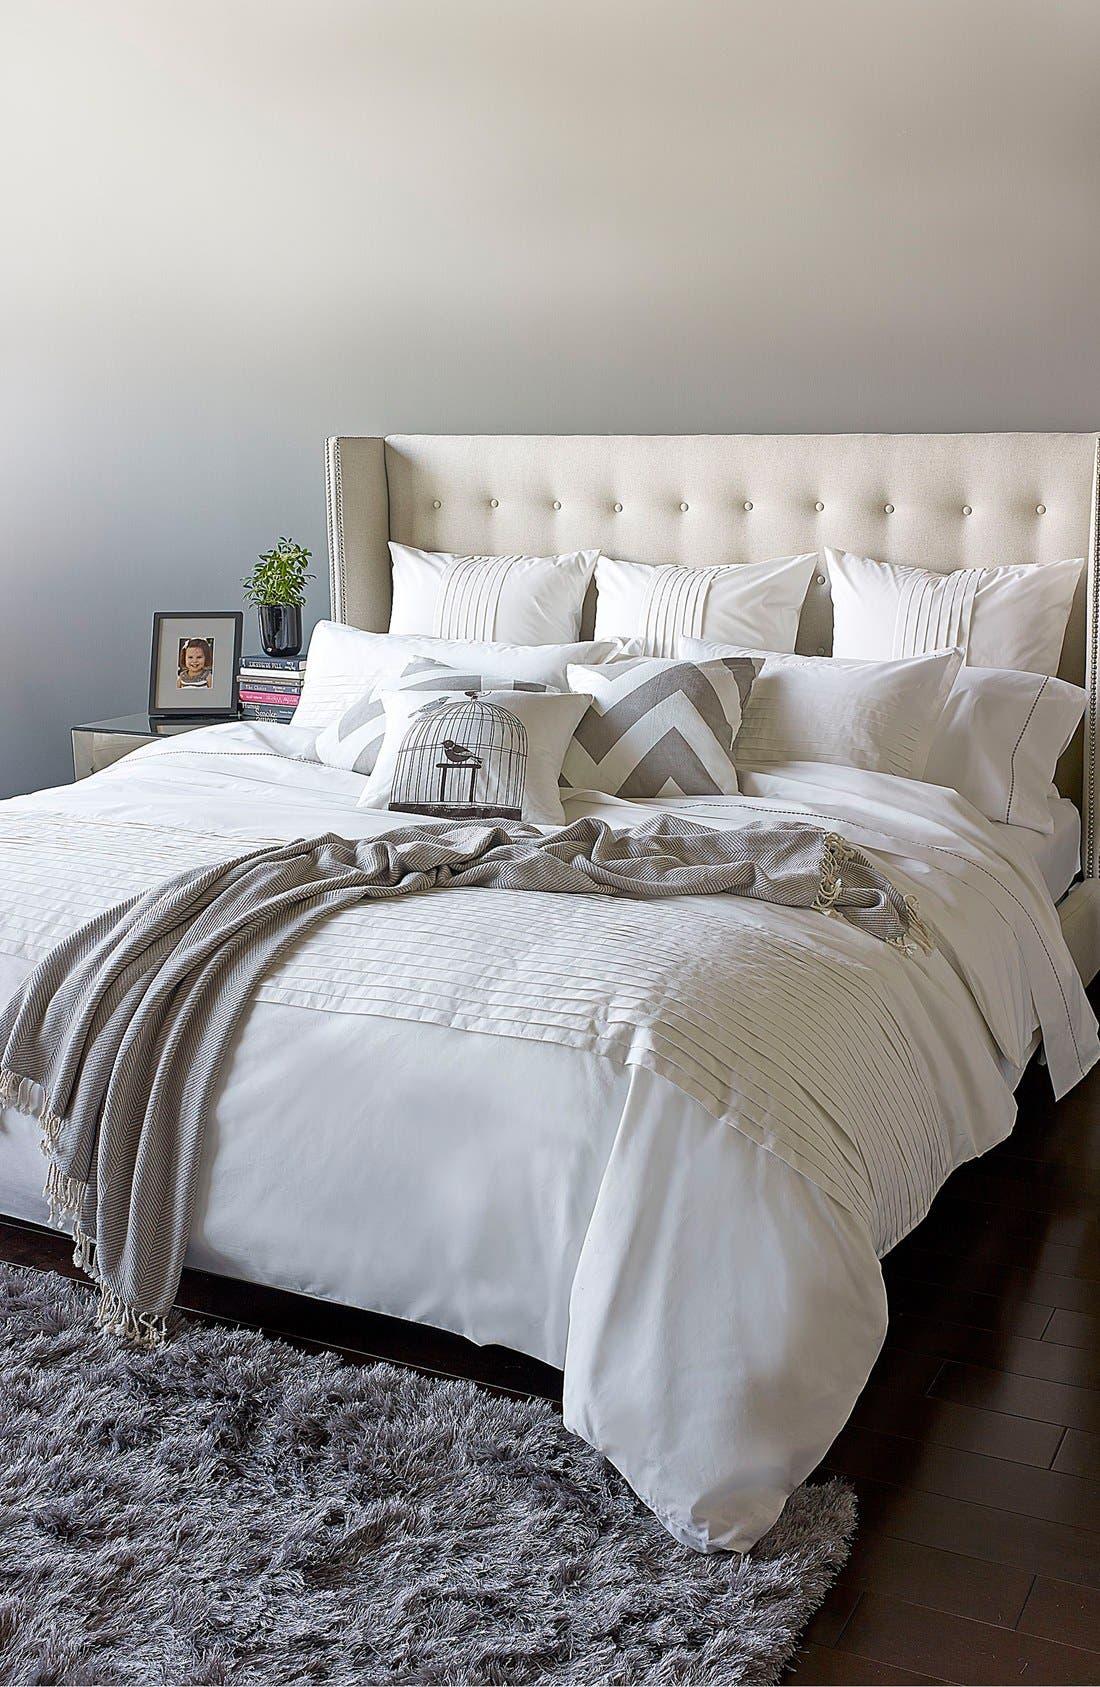 zestt Organic Cotton 'Block Island' Bedding Collection